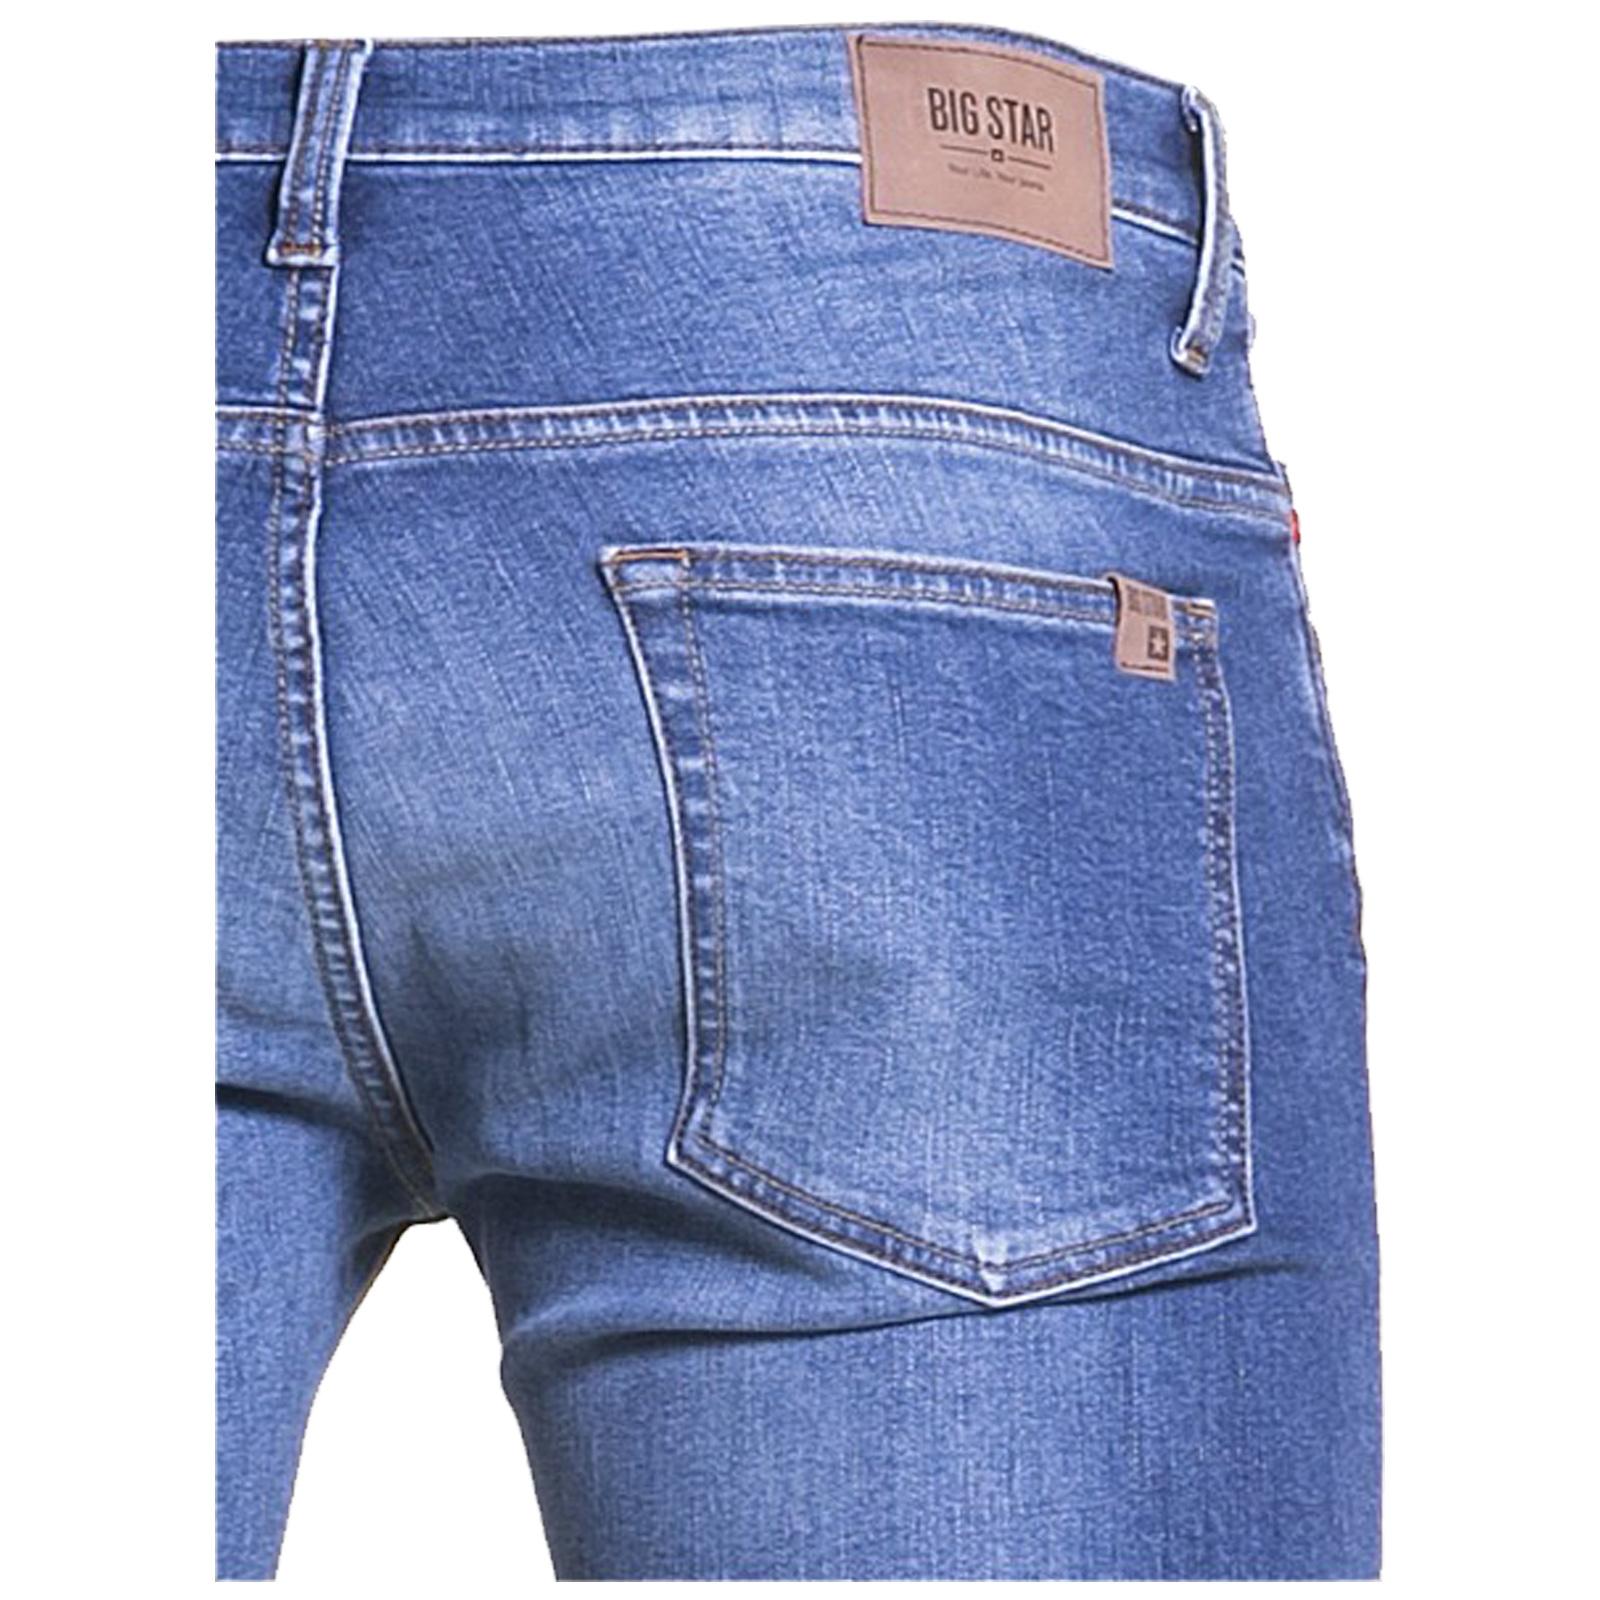 Big-Star-Mens-Denim-Jeans-Straight-Tapered-Leg-Style-Designer-Casual-Trousers thumbnail 7